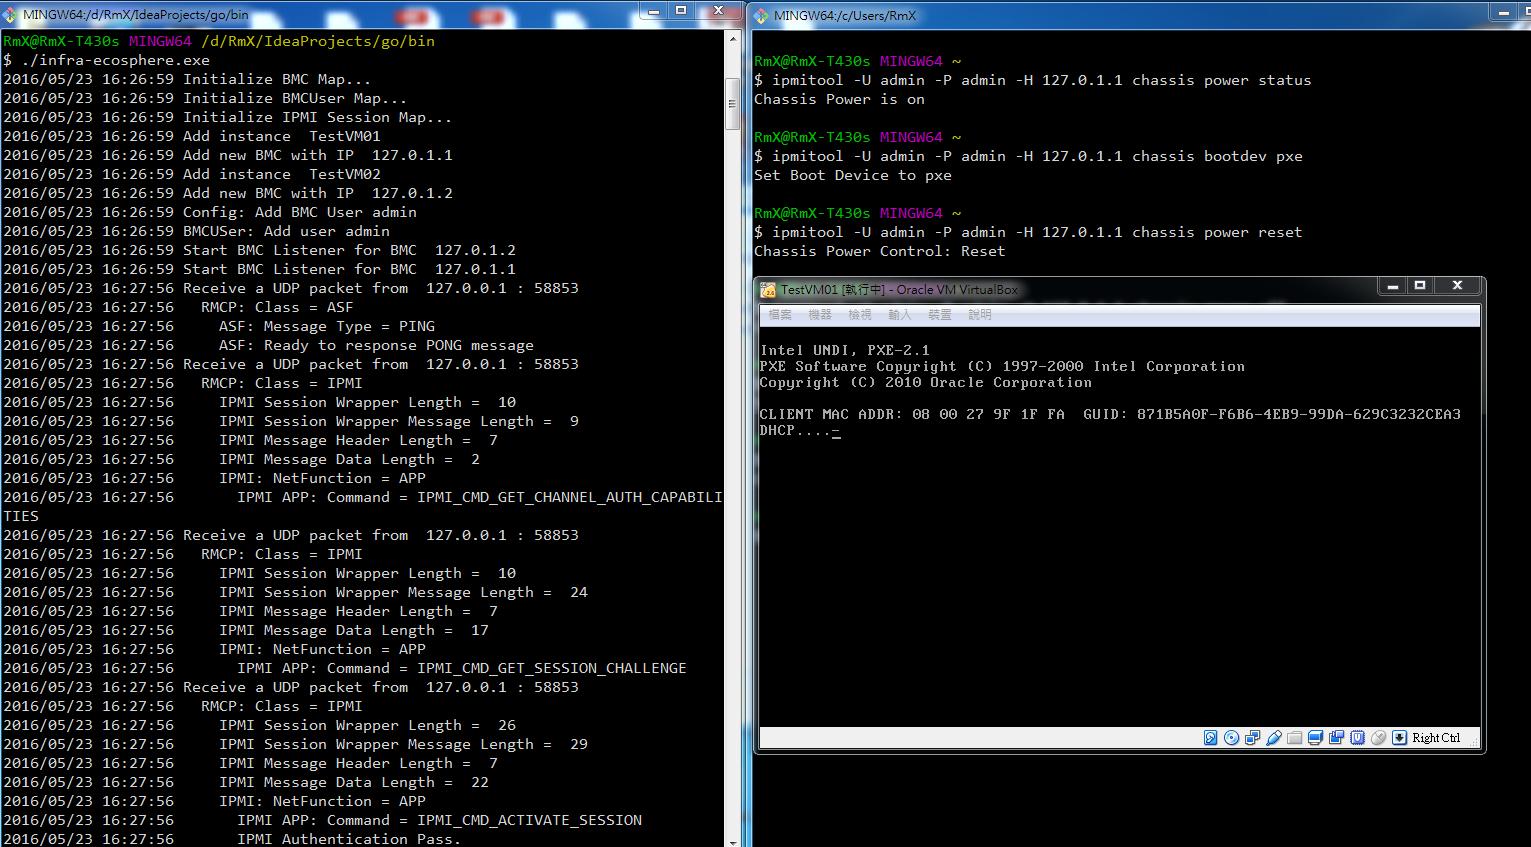 GitHub - rmxymh/infra-ecosphere: Provisioning Emulator with